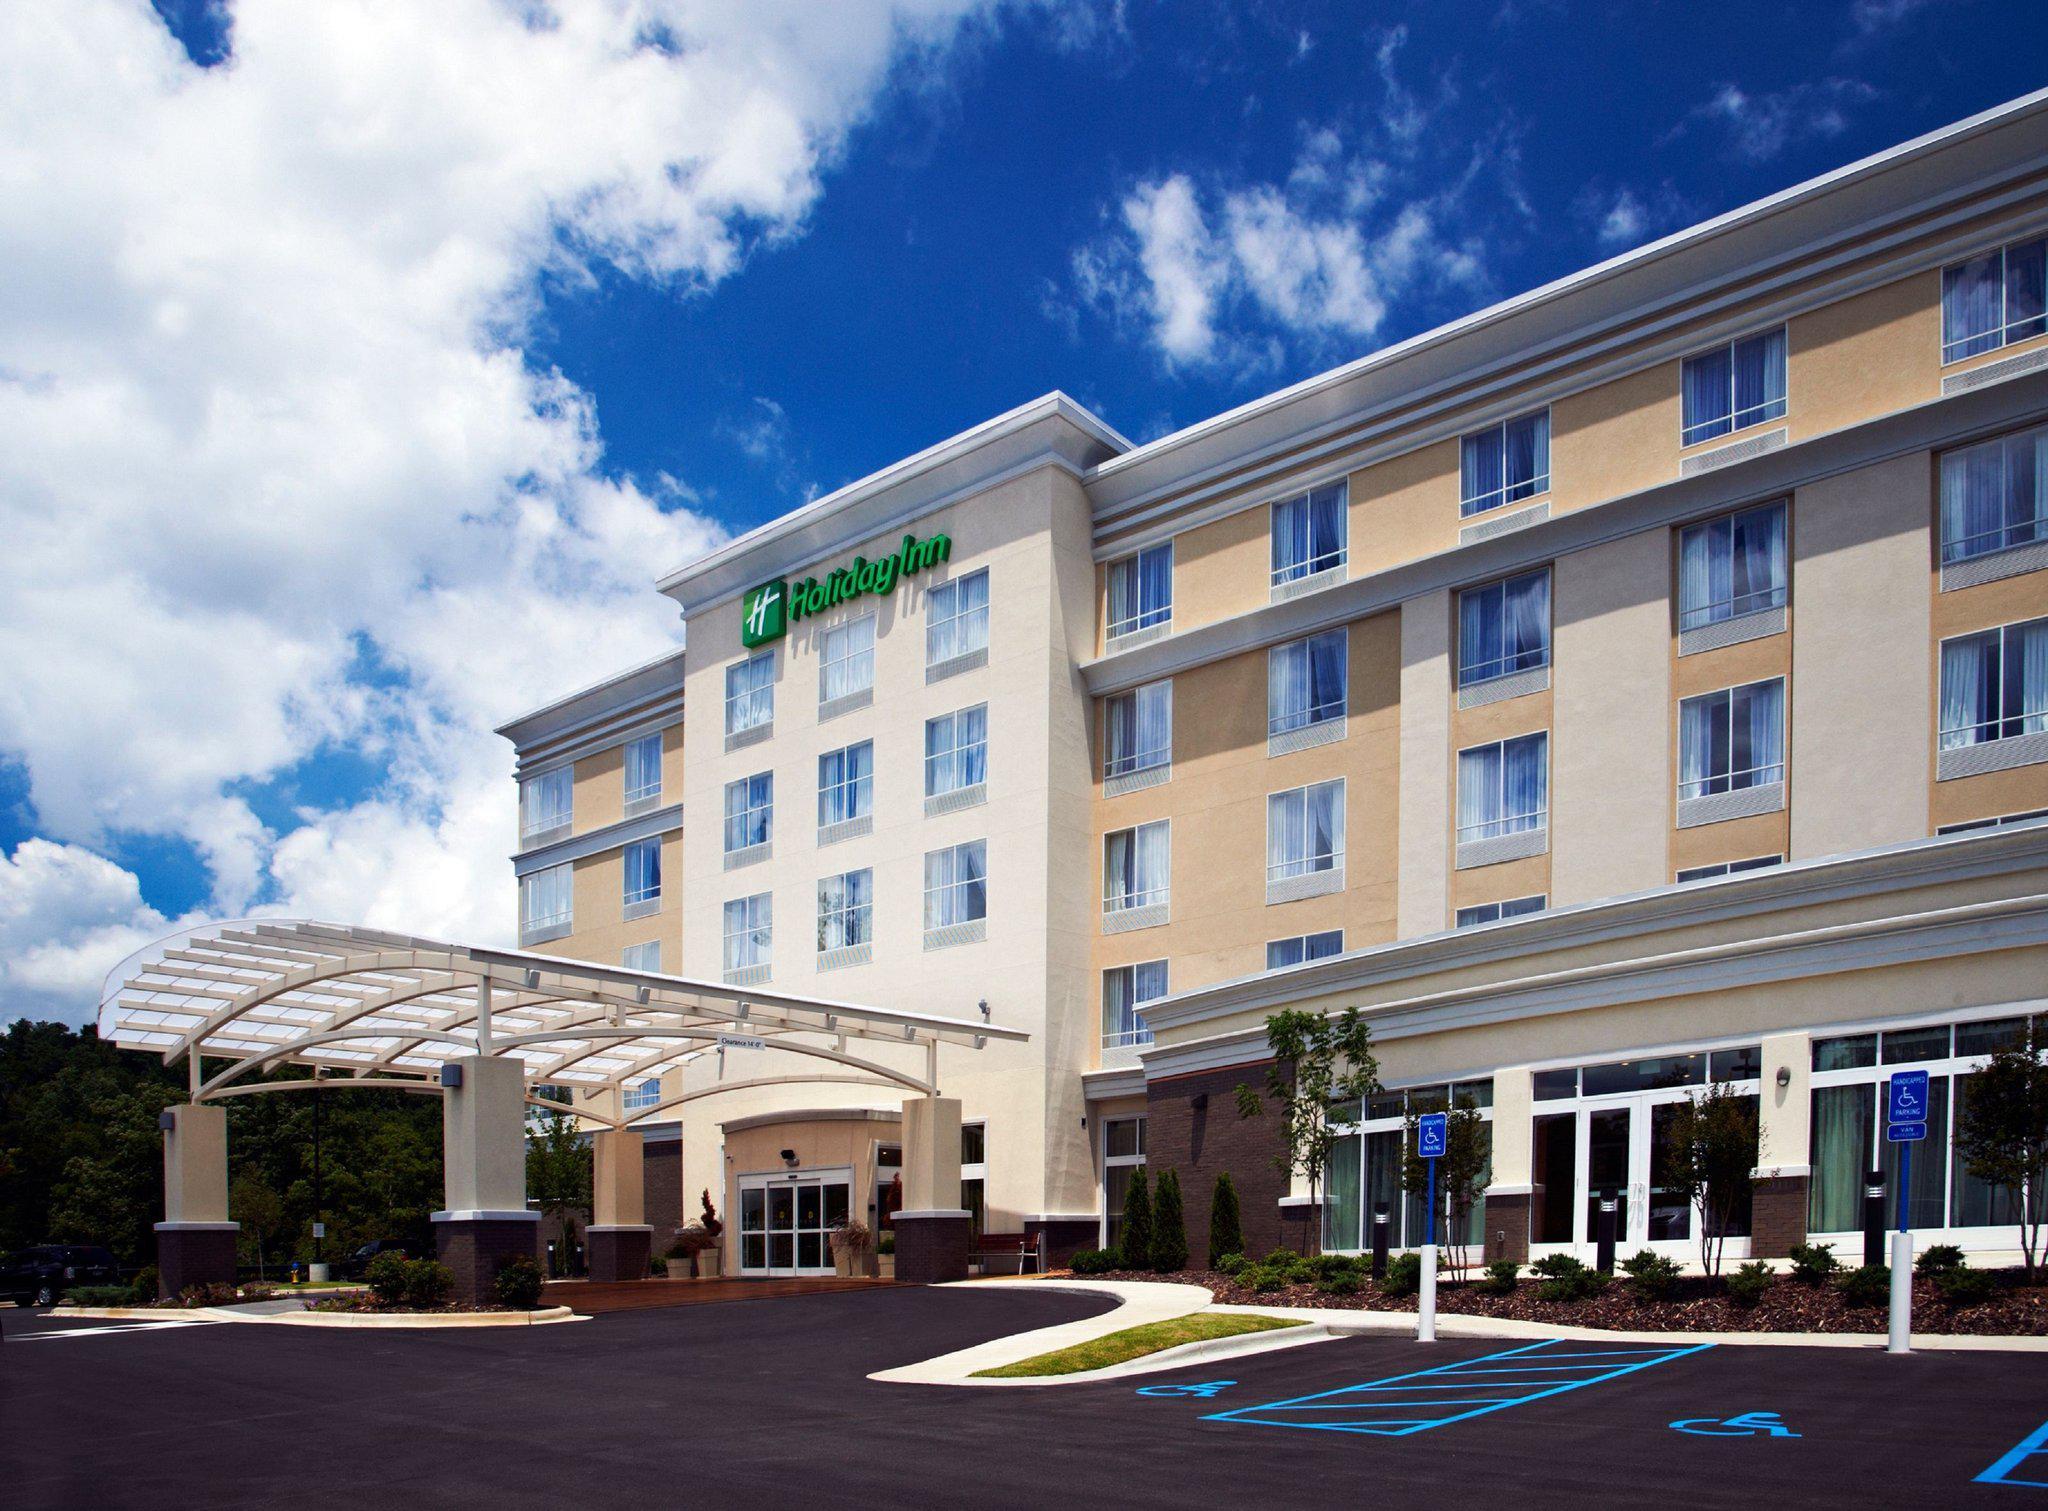 Holiday Inn Birmingham - Hoover, an IHG Hotel